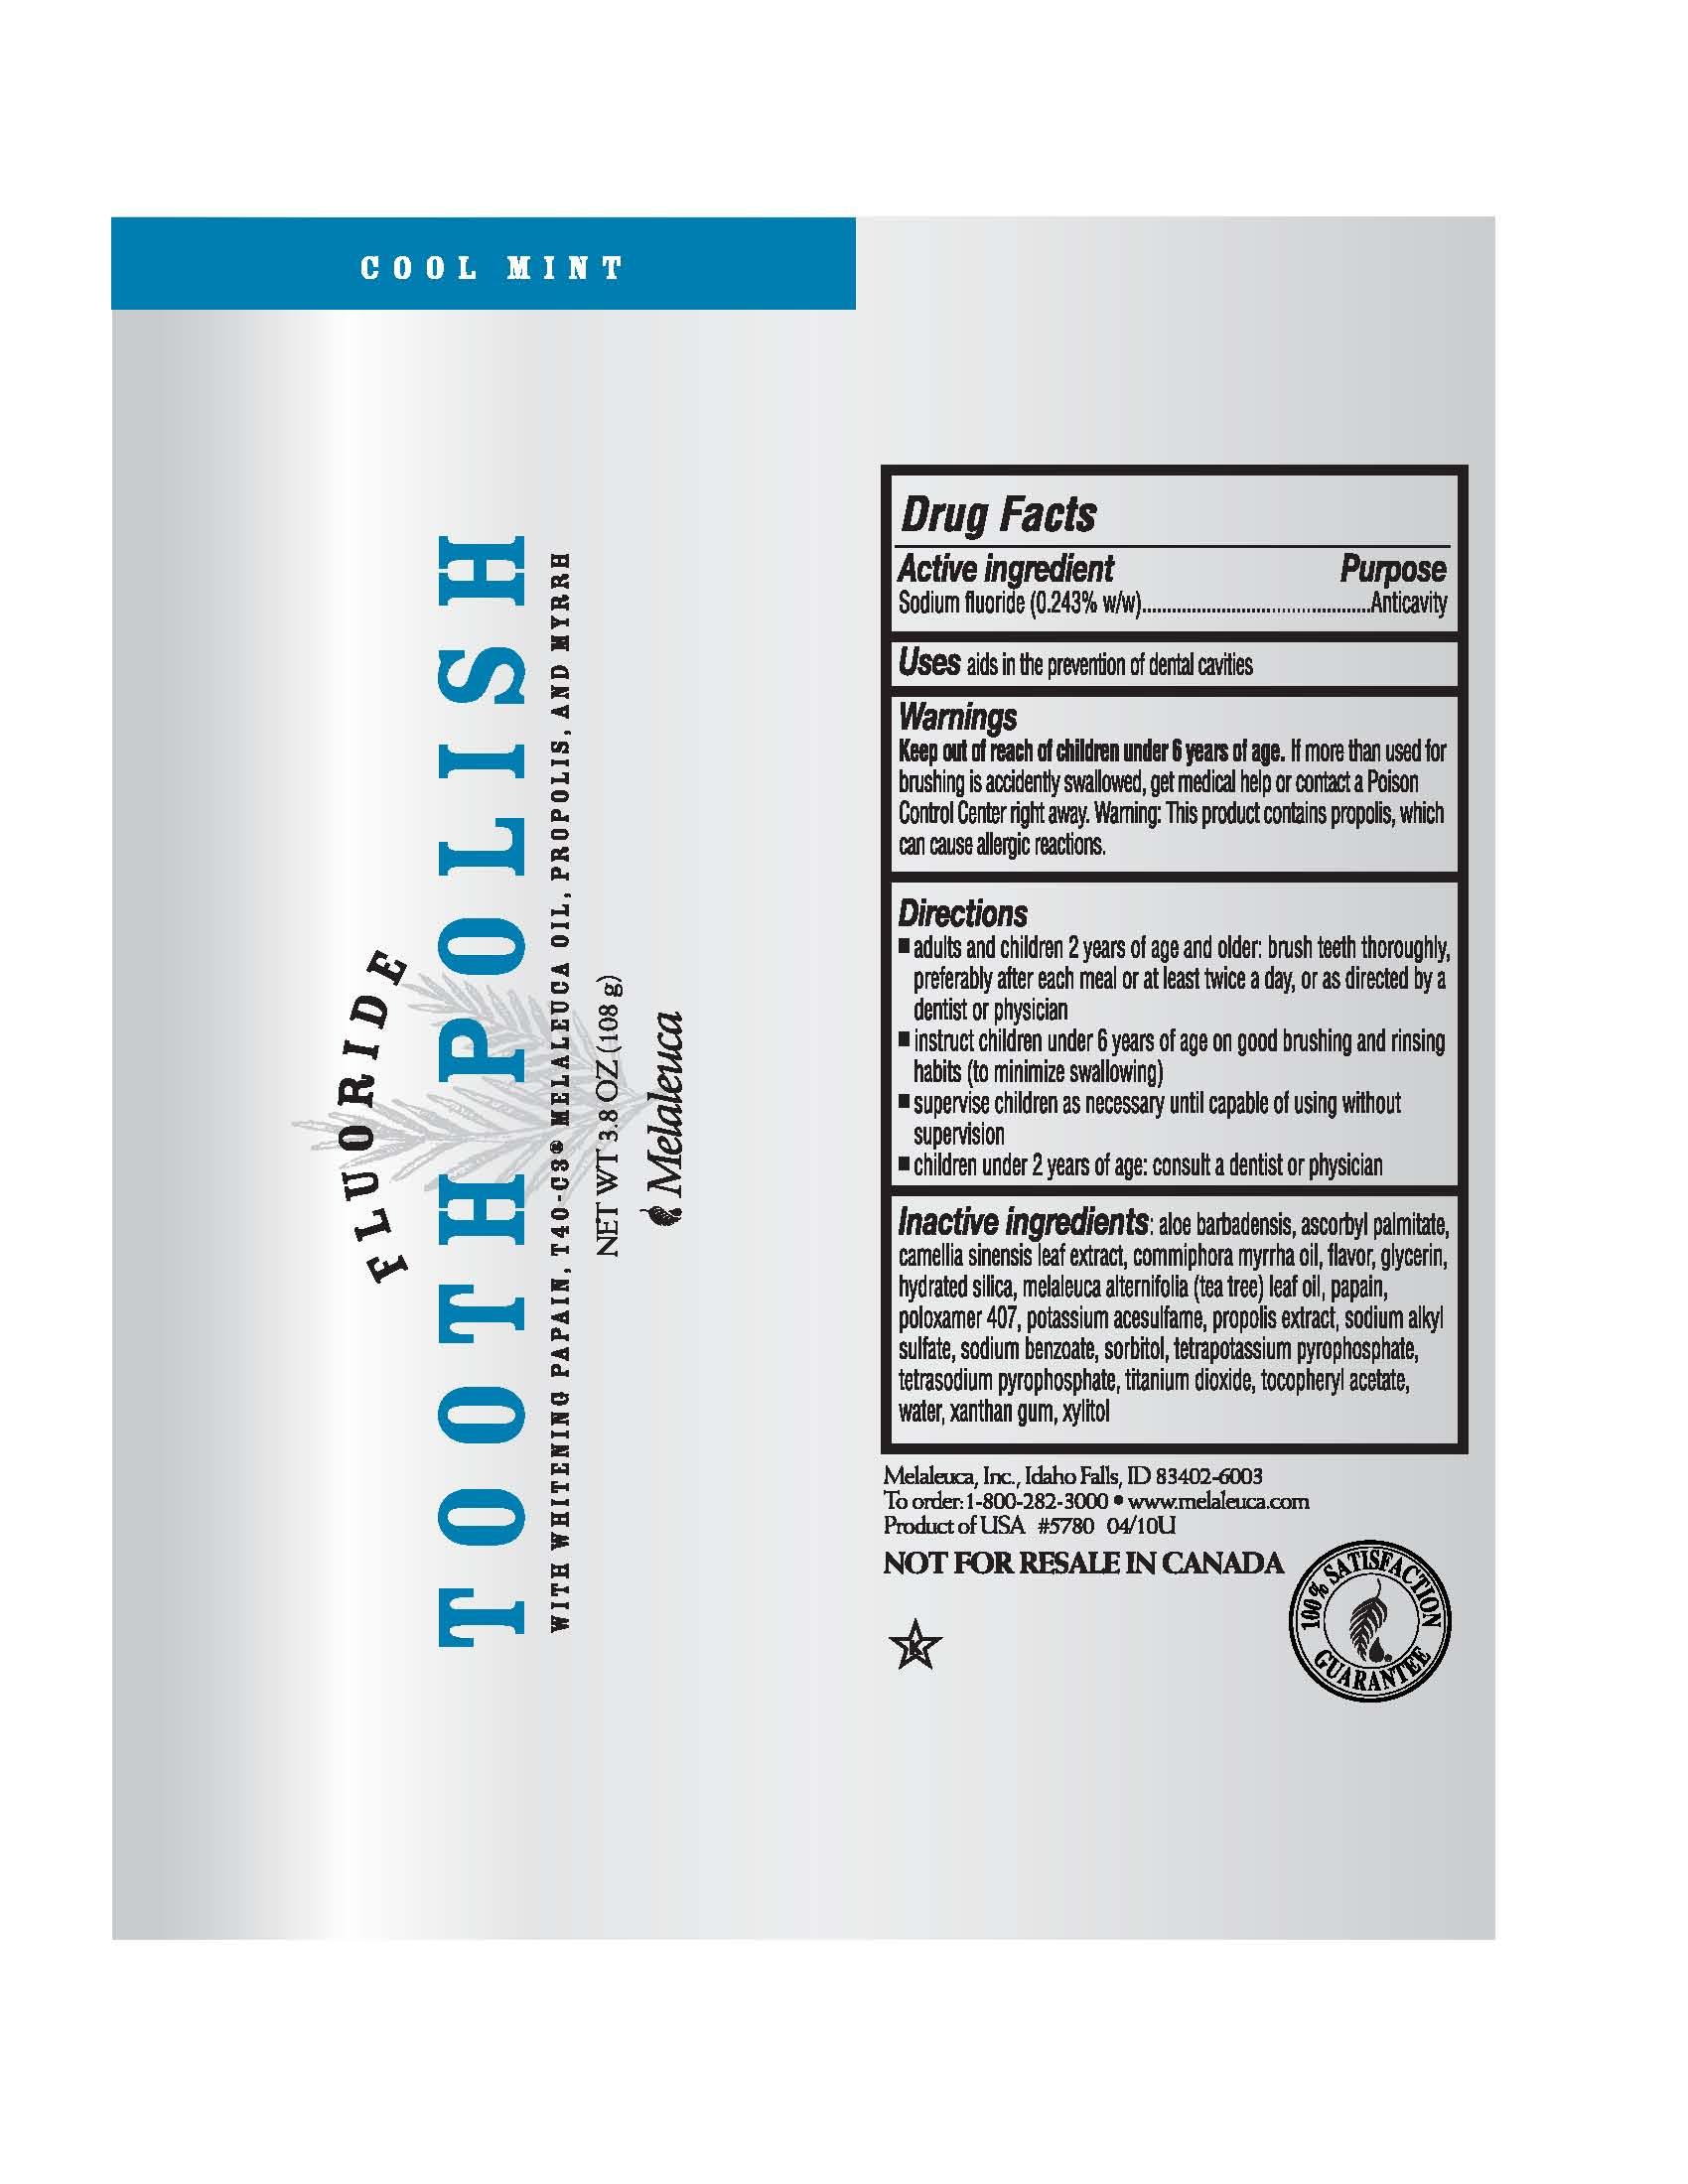 Whitening Tooth Polish (Sodium Fluoride) Paste [Melaleuca, Inc.]